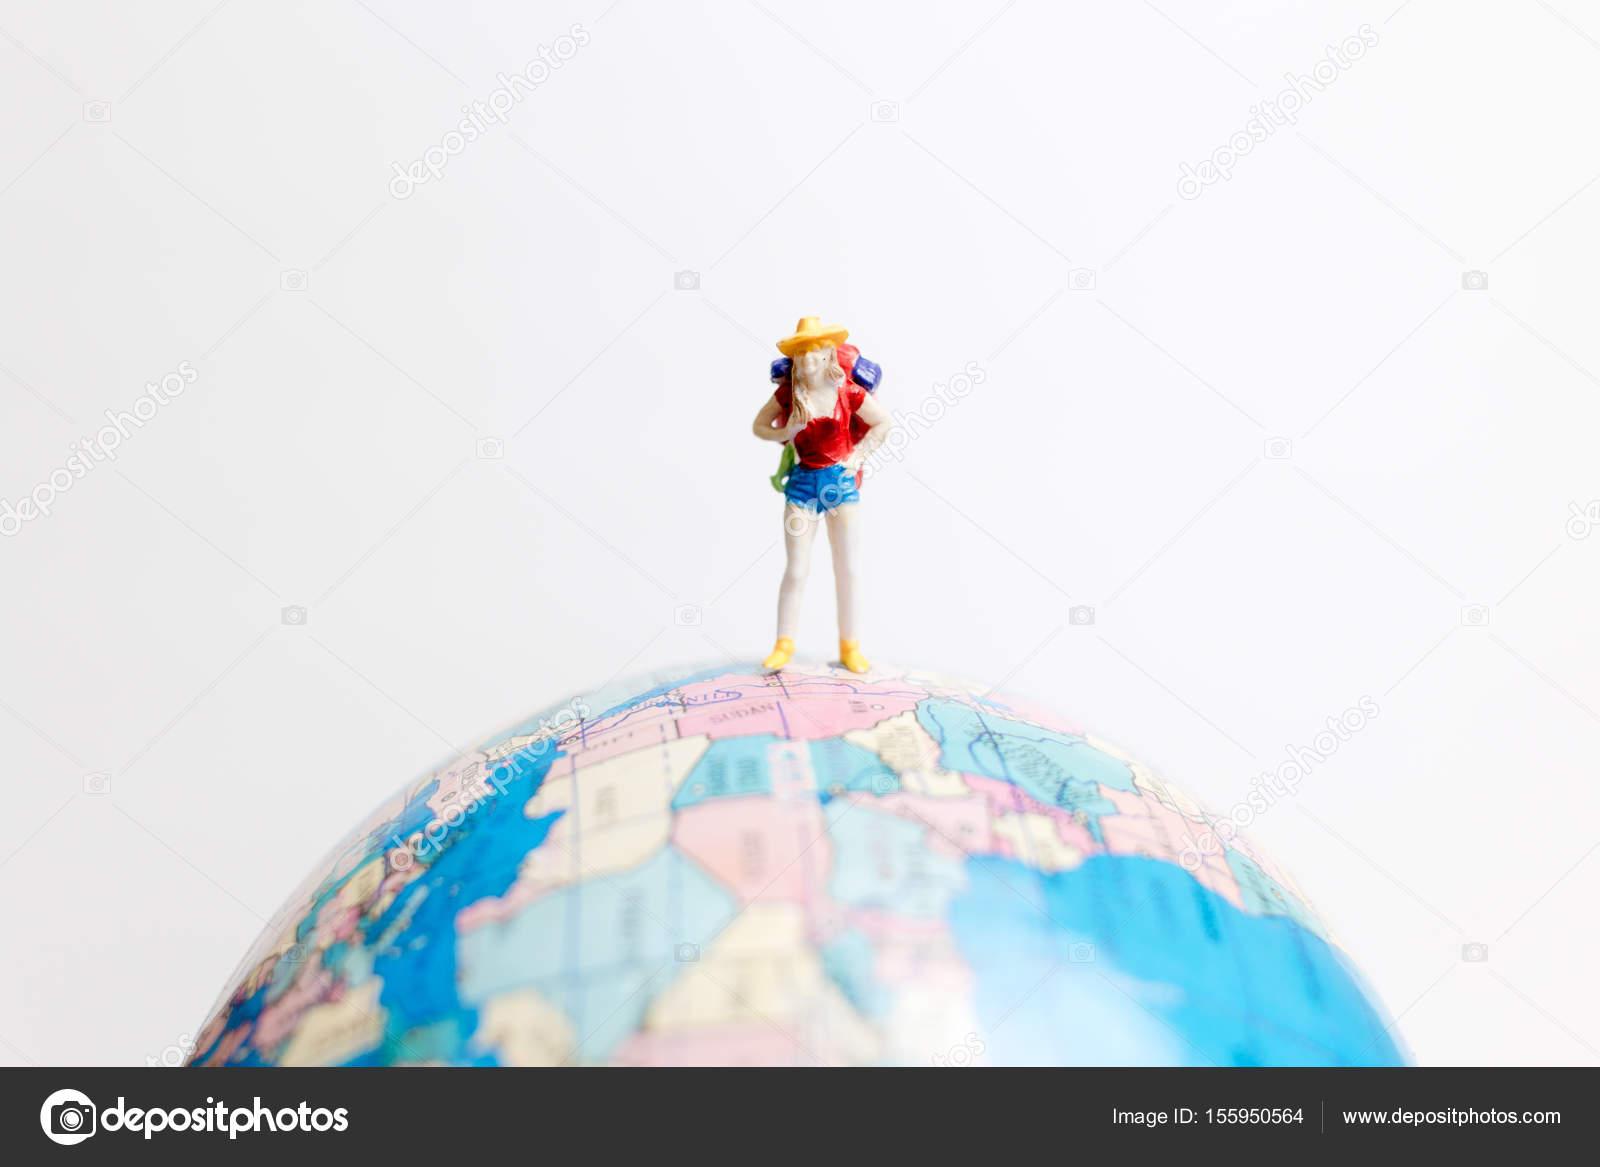 Miniature people figure standing on the globe world map stock miniature people figure standing on the globe world map stock photo gumiabroncs Choice Image